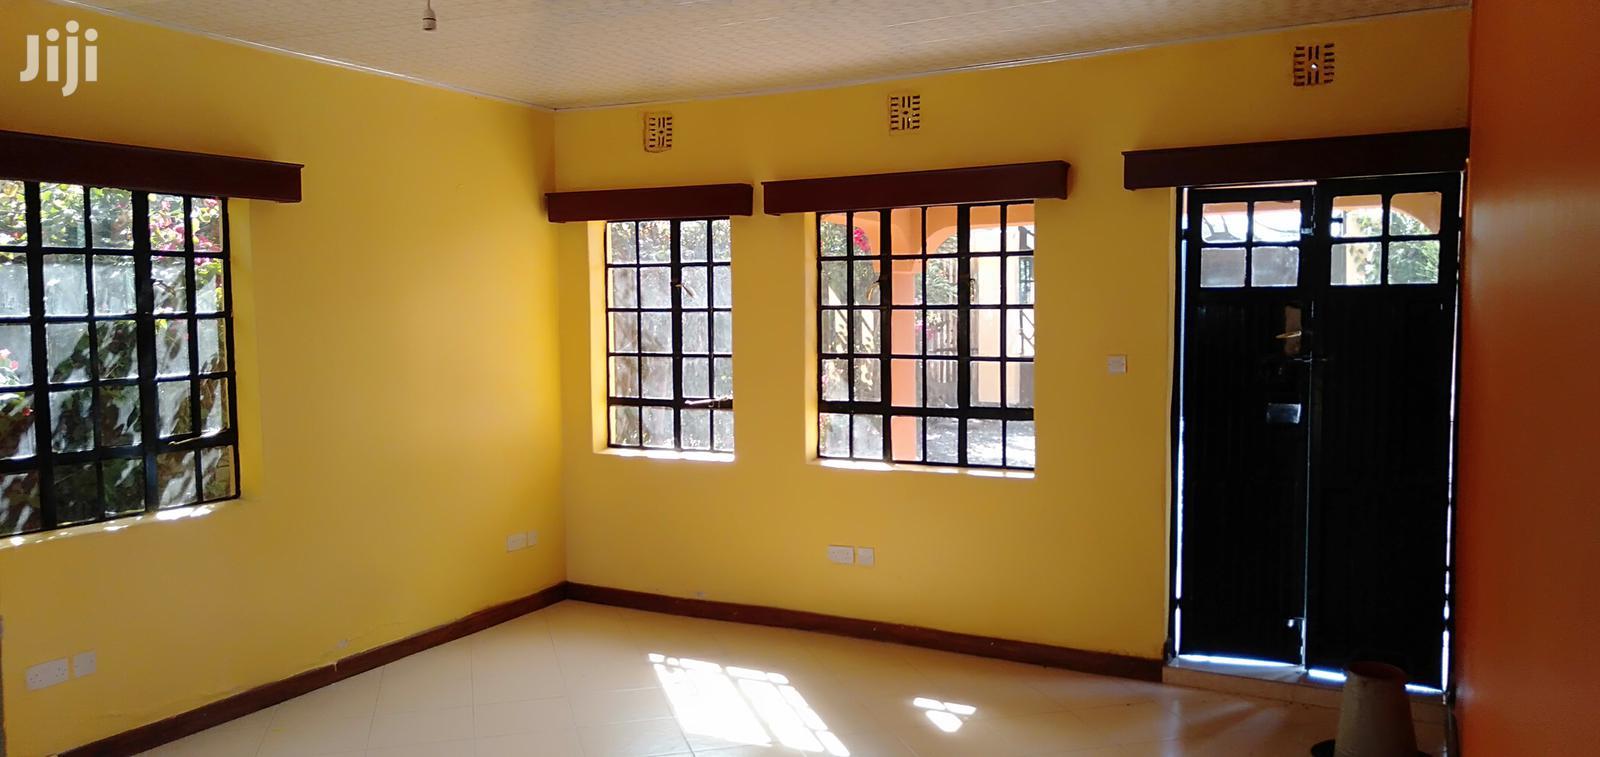 Archive: 4 Bedroom Bungalow Kitengela